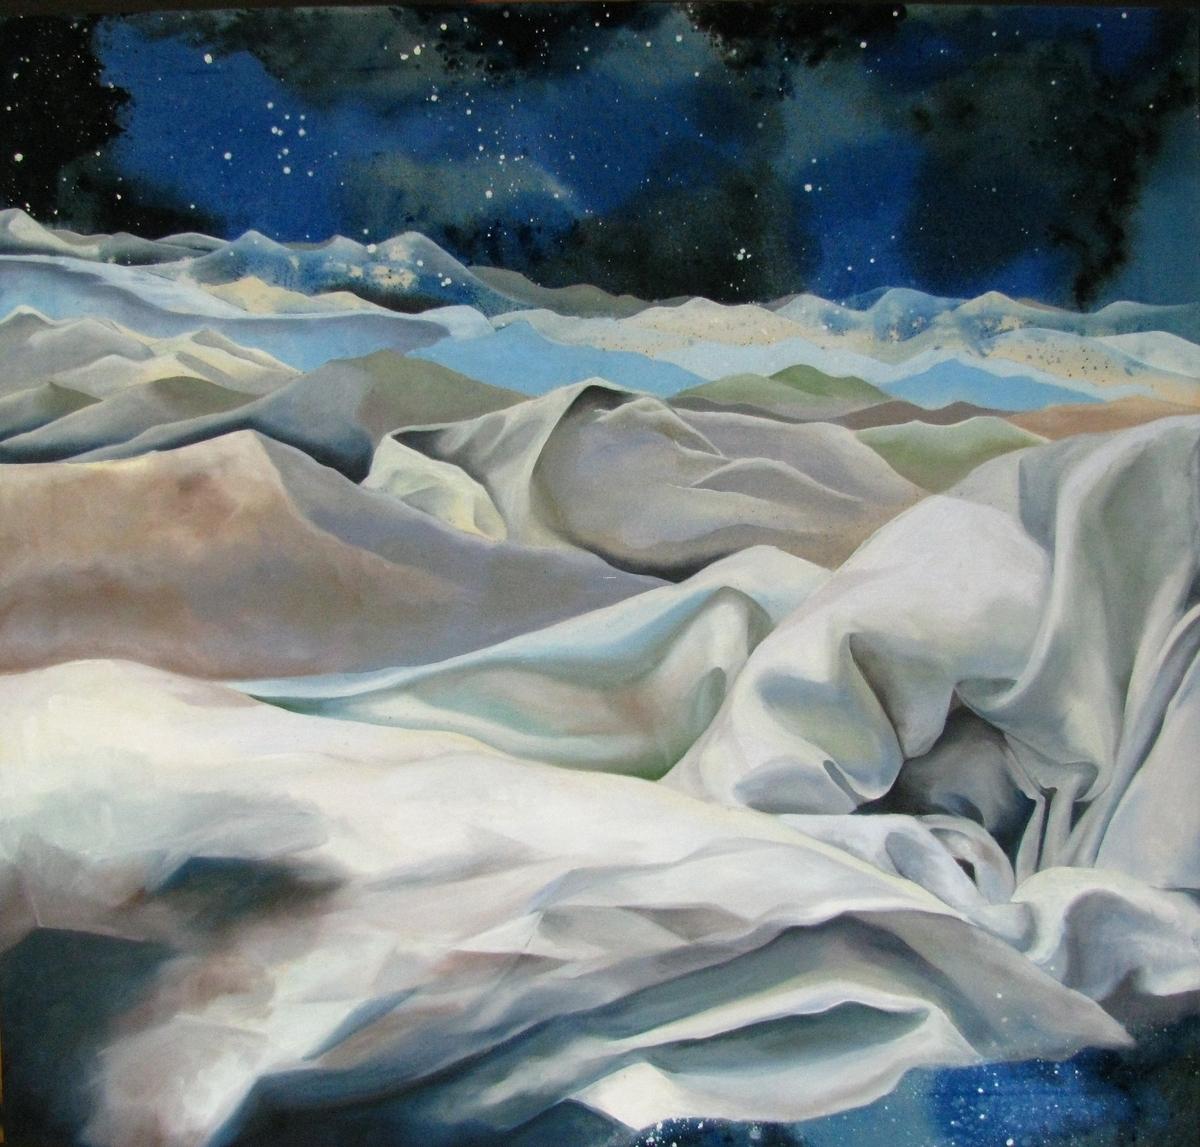 Stars & Sleep (large view)